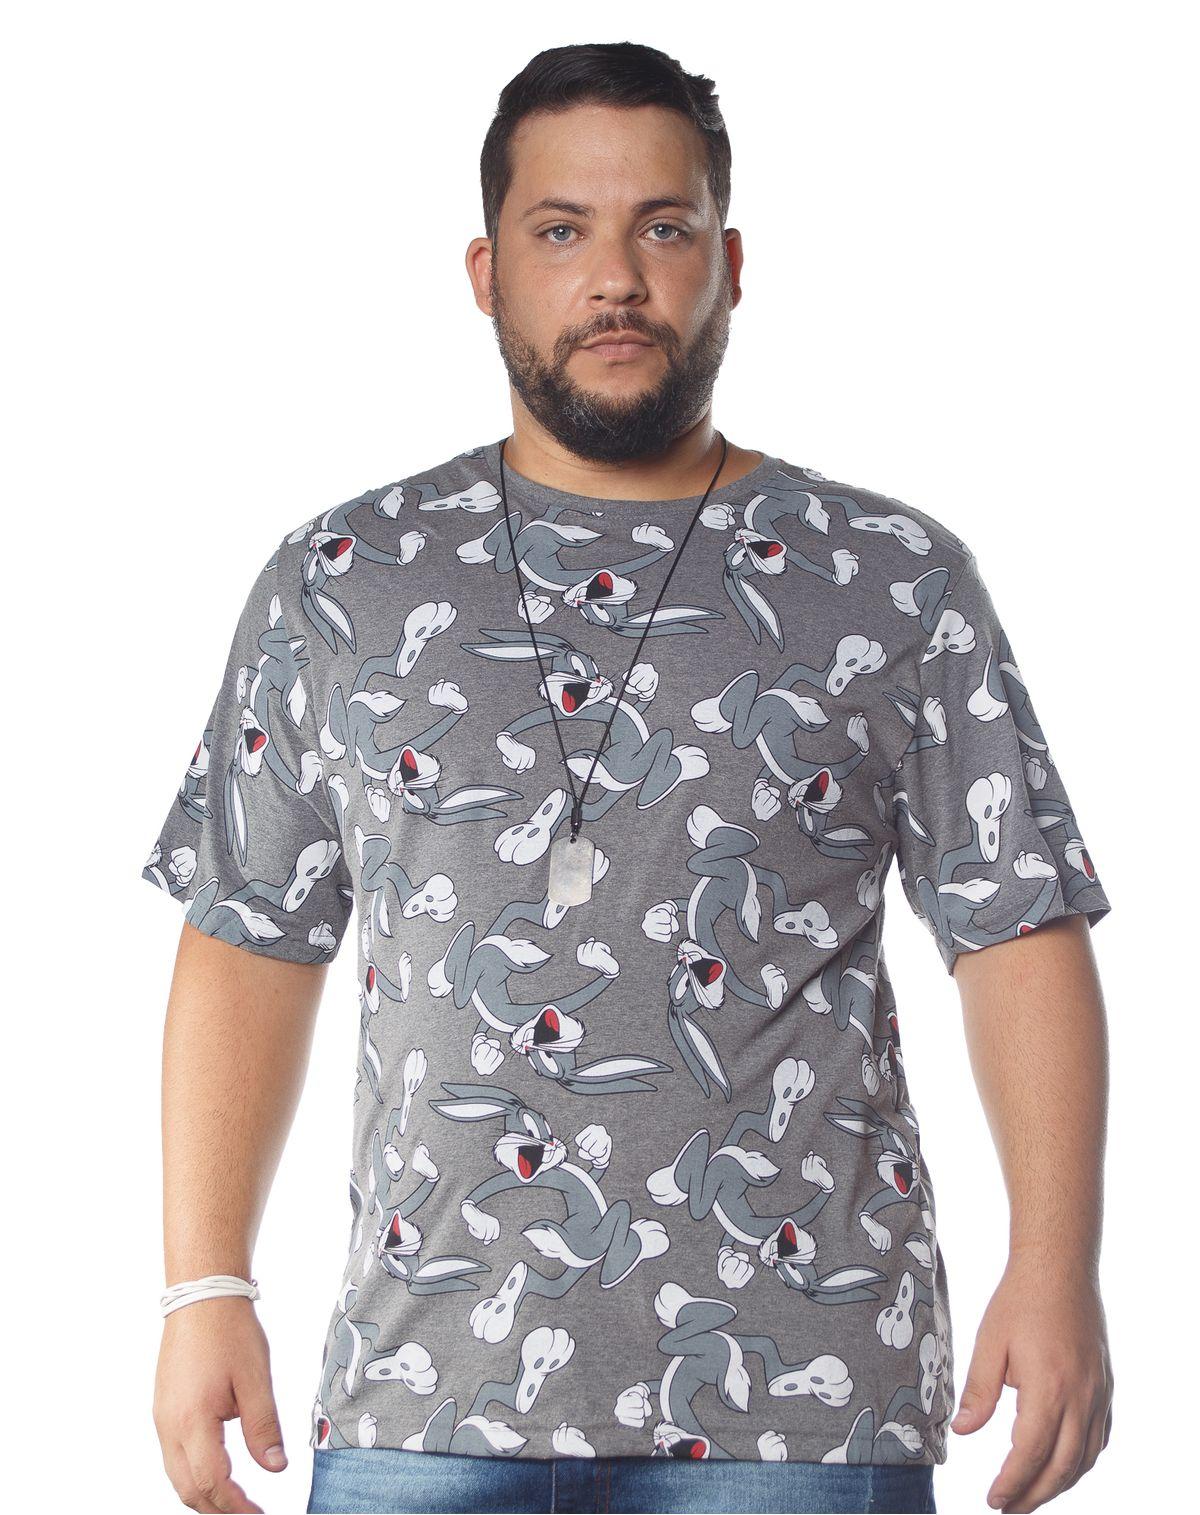 551870002-camiseta-masculina-plus-size-pernalonga-looney-tunes-mescla-g2-504